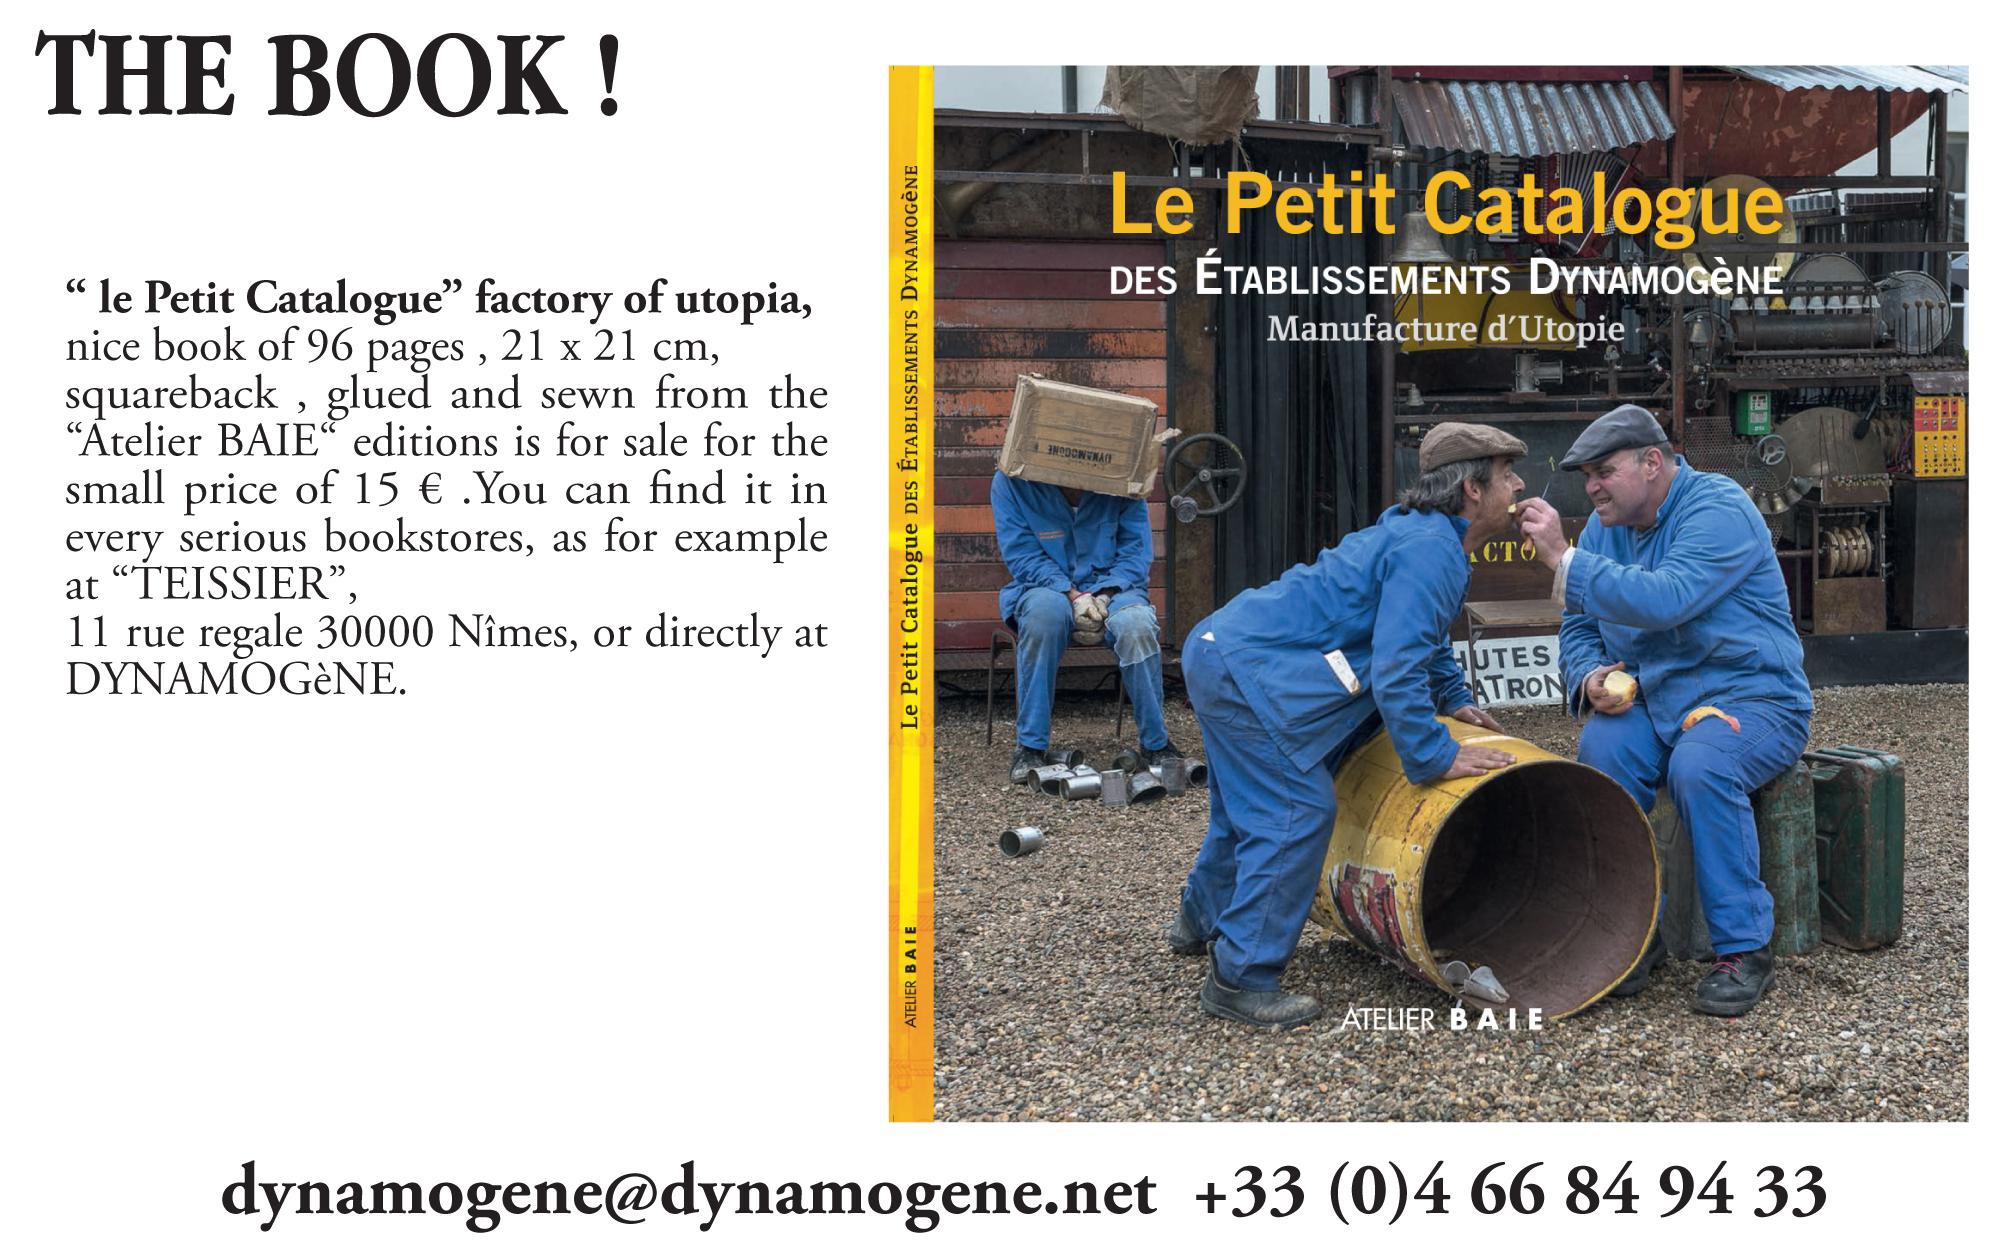 dynamogene-the-book-le-petit-catalogue